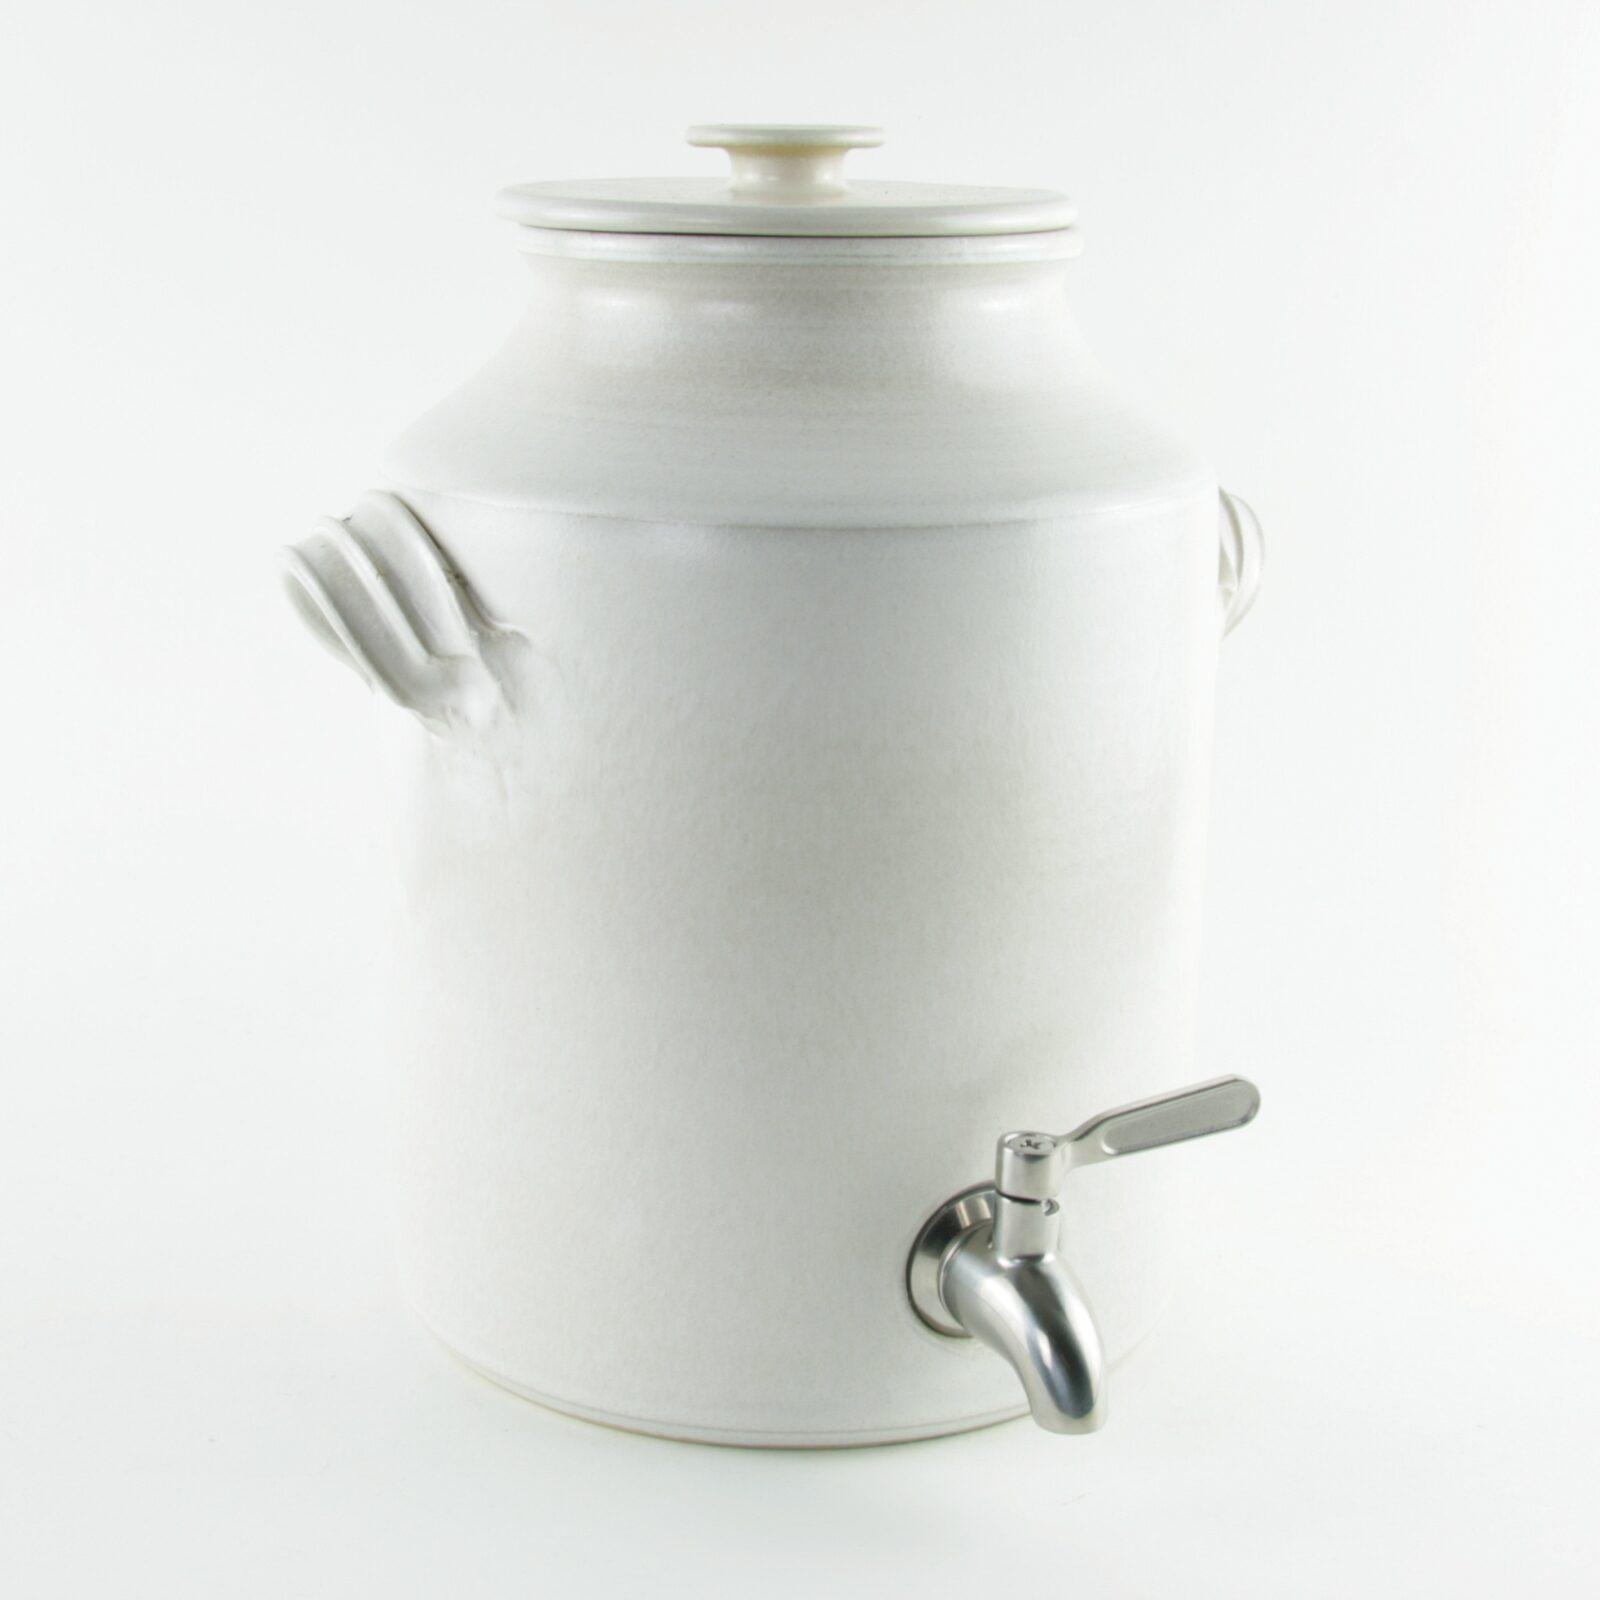 Large ceramic kombucha crock 4 litres